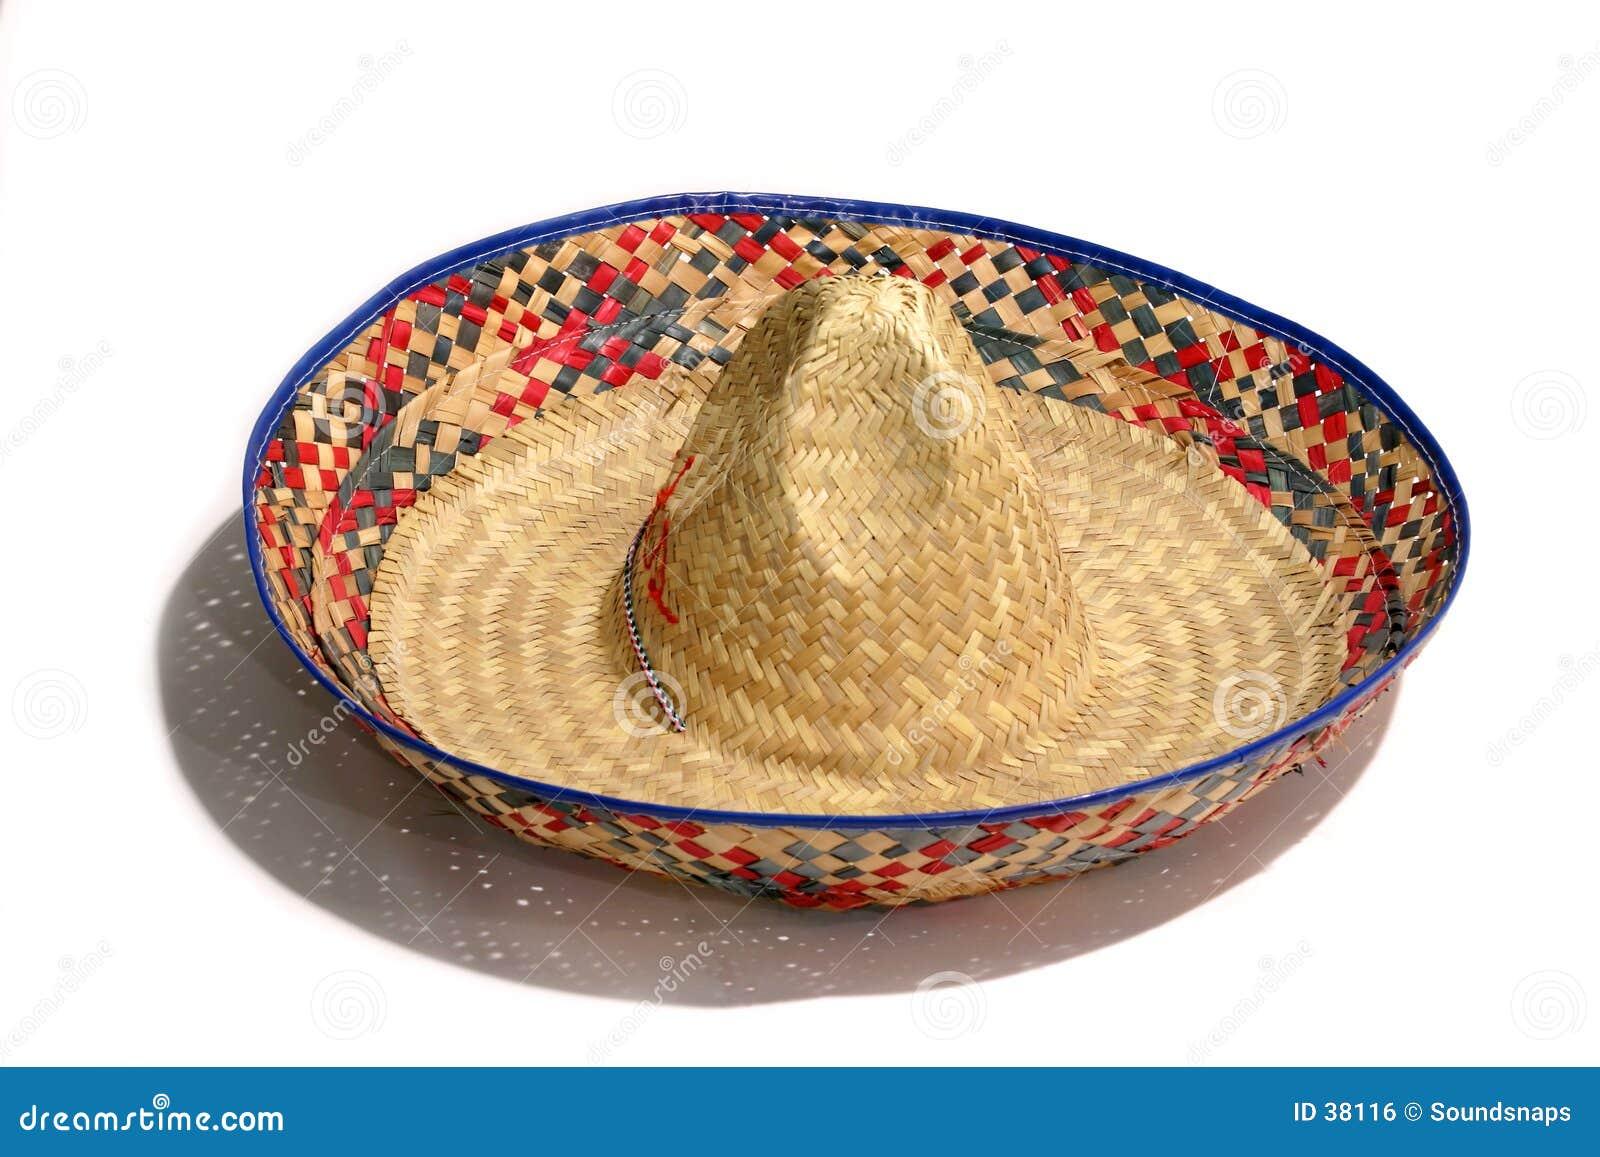 Sombrero-Hut